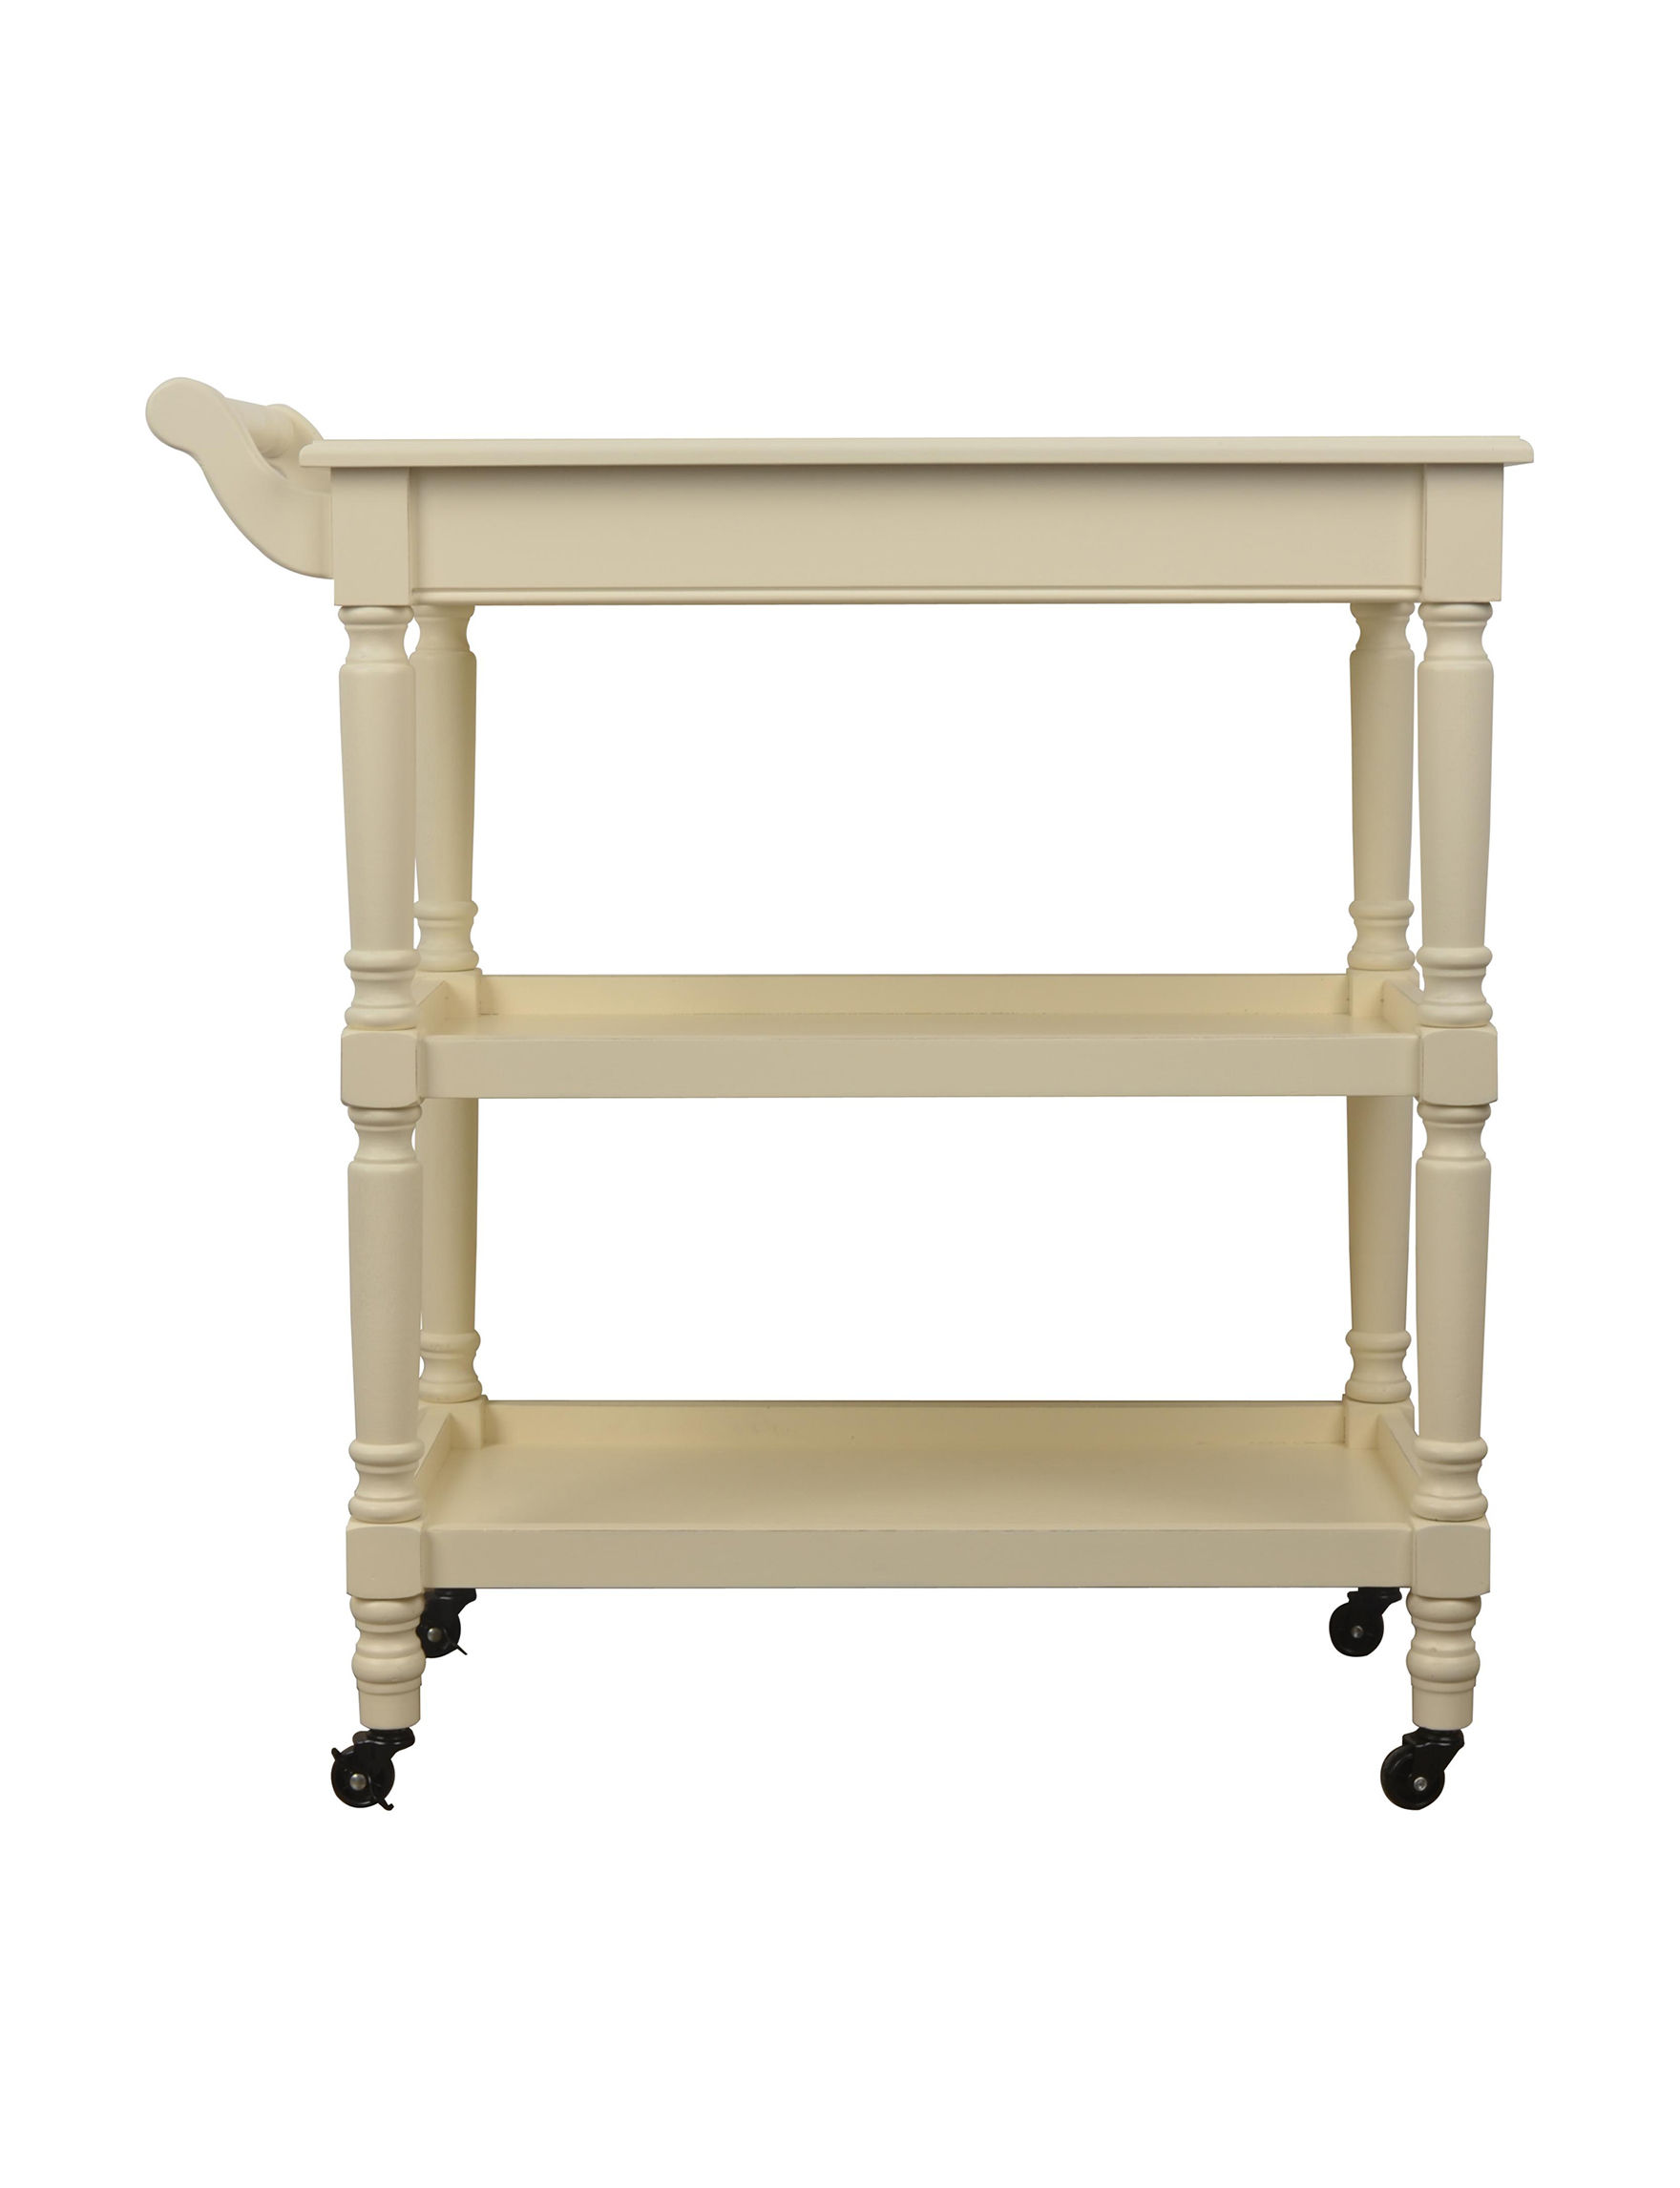 Decor Therapy White Bar & Wine Storage Kitchen Islands & Carts Kitchen & Dining Furniture